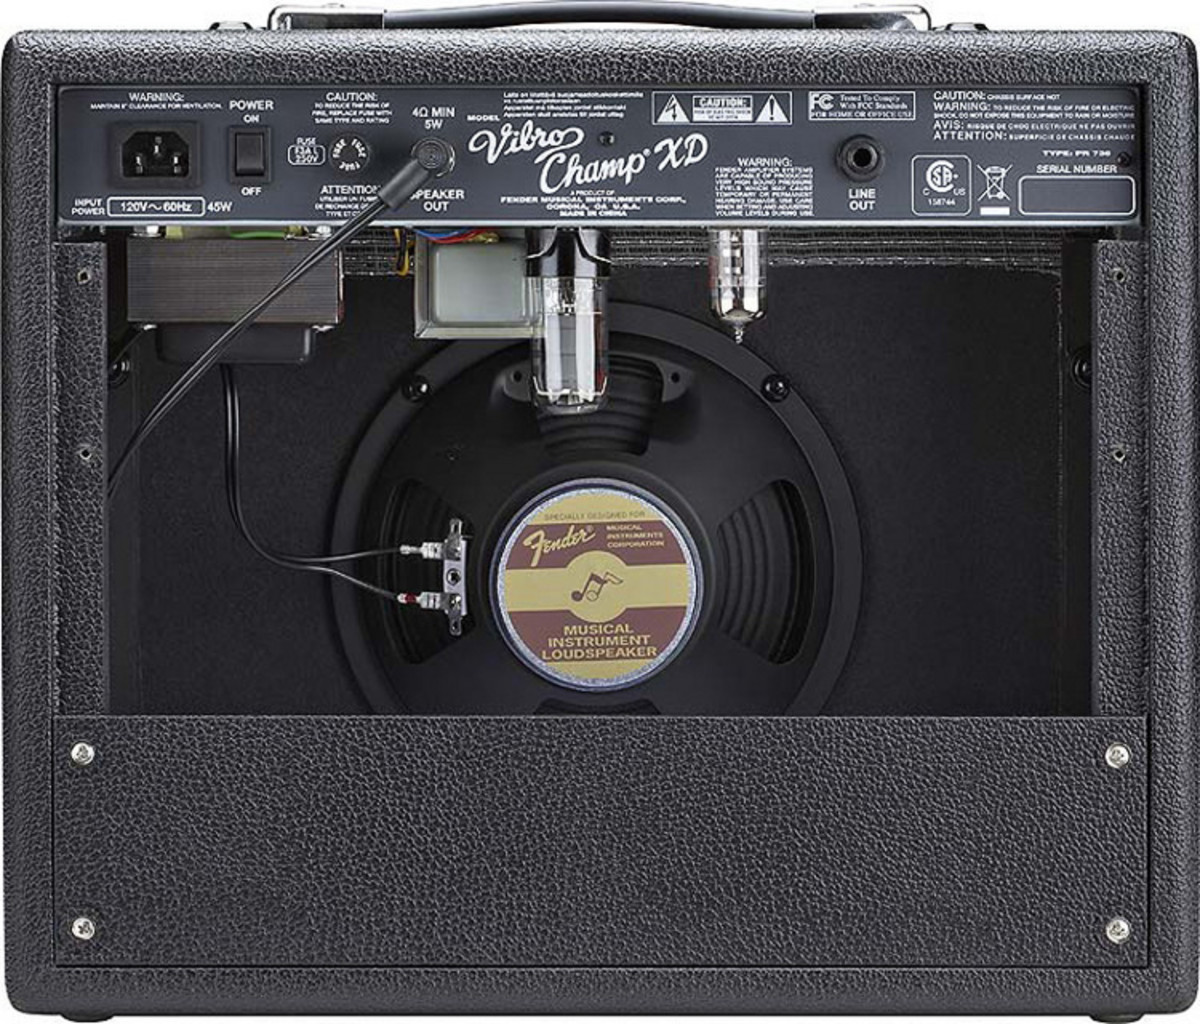 DISC Fender Vibro Champ XD - 5 Watt Class A Combo at